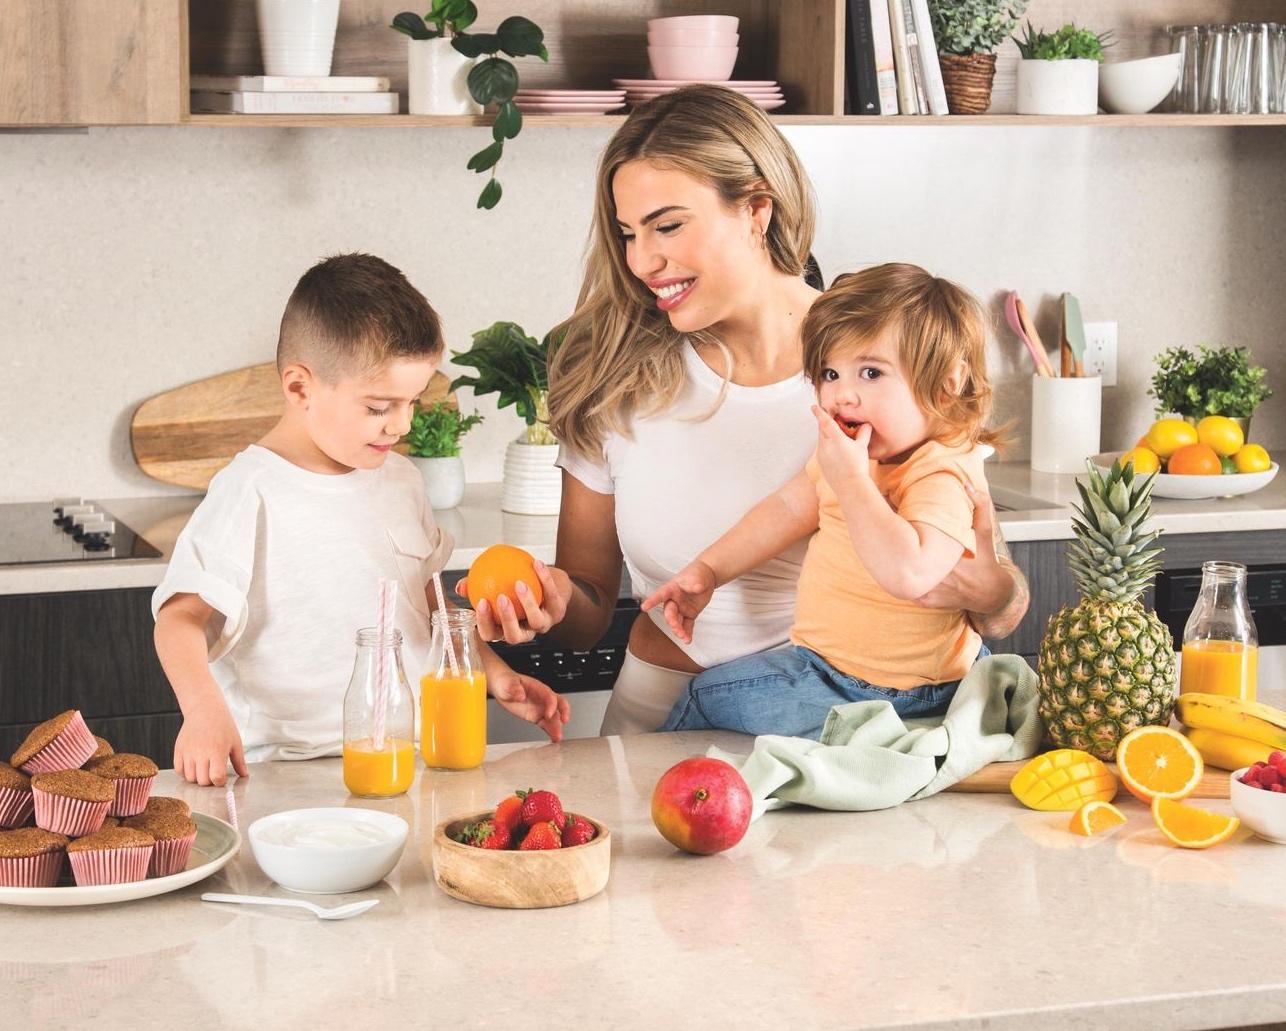 Victoria-Kultz-avec-ses-enfants